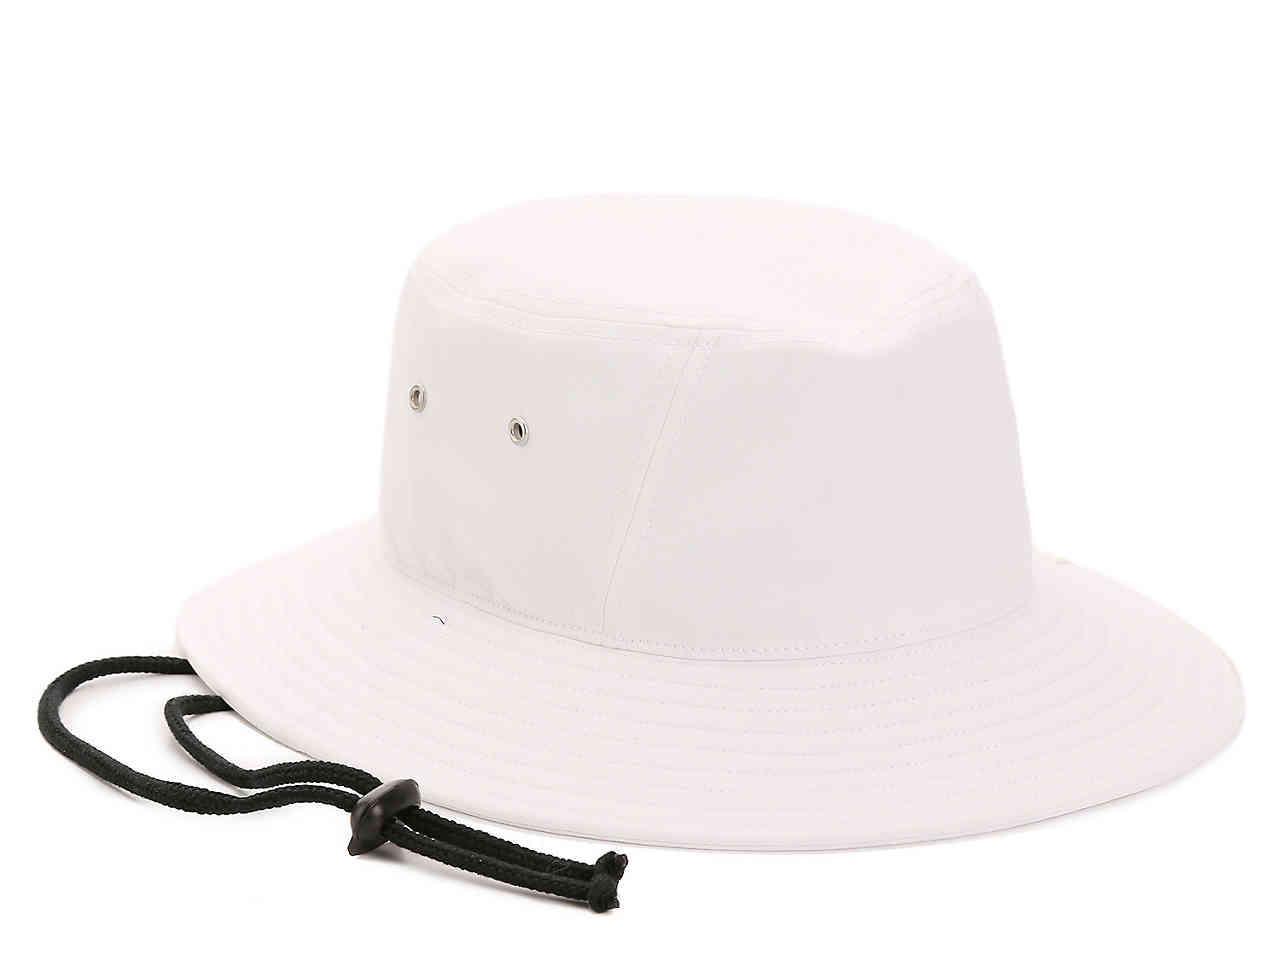 Lyst - Adidas Victory Ii Bucket Hat in White for Men 4ce55afa77e